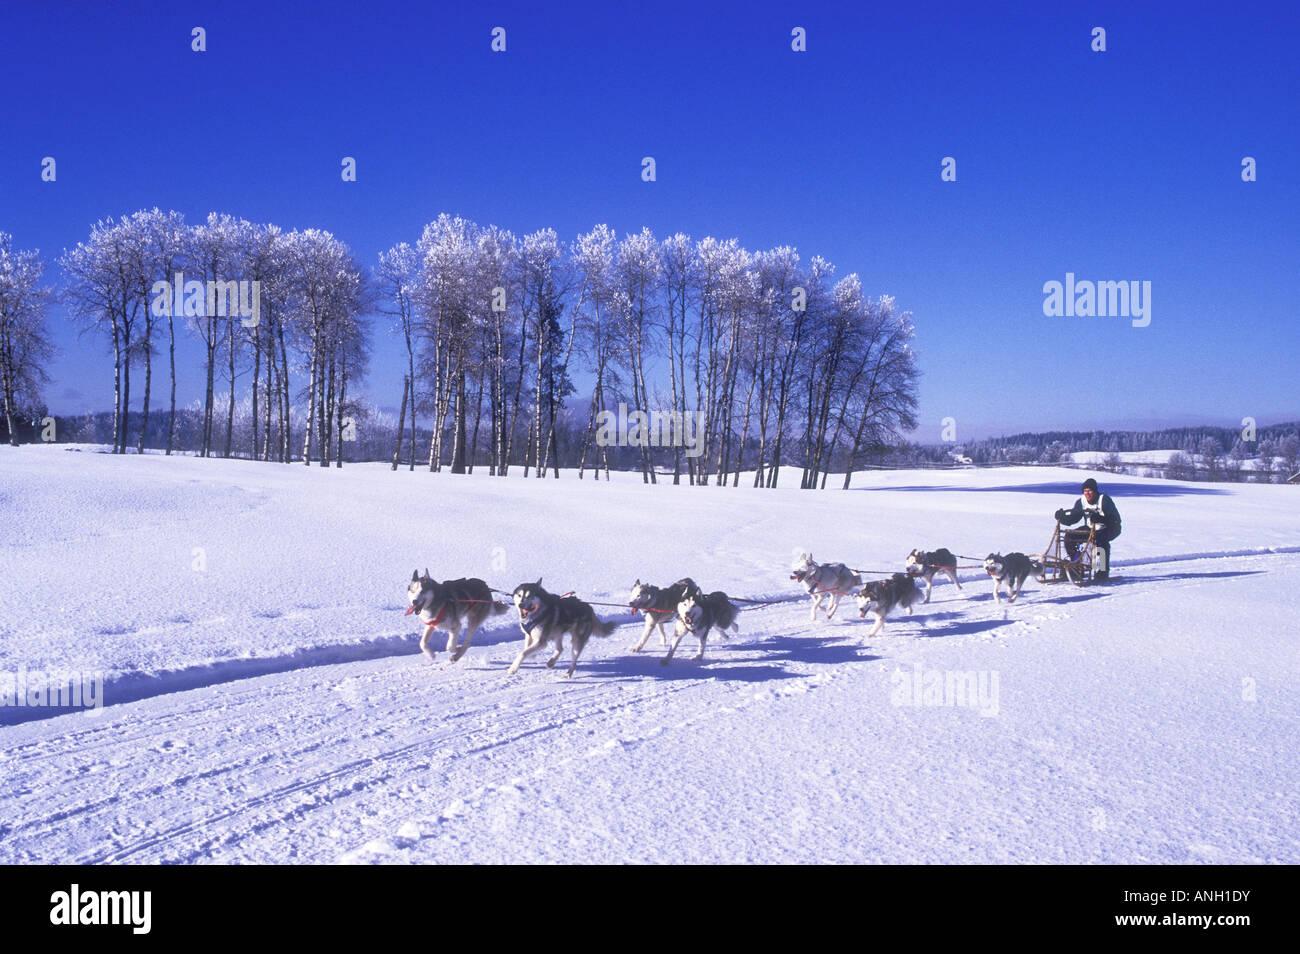 Dogsledding in the Cariboo region of British Columbia, Canada. - Stock Image